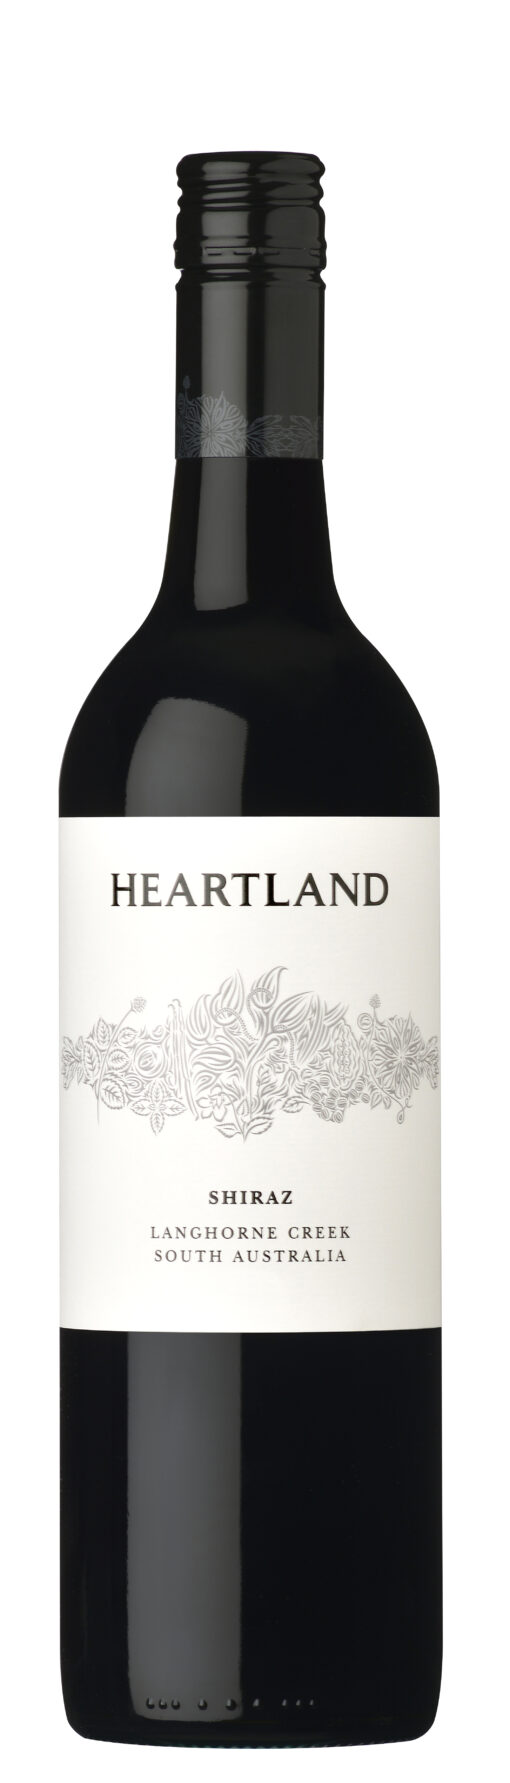 Heartland Wines, Shiraz Langhorne Creek, 2016